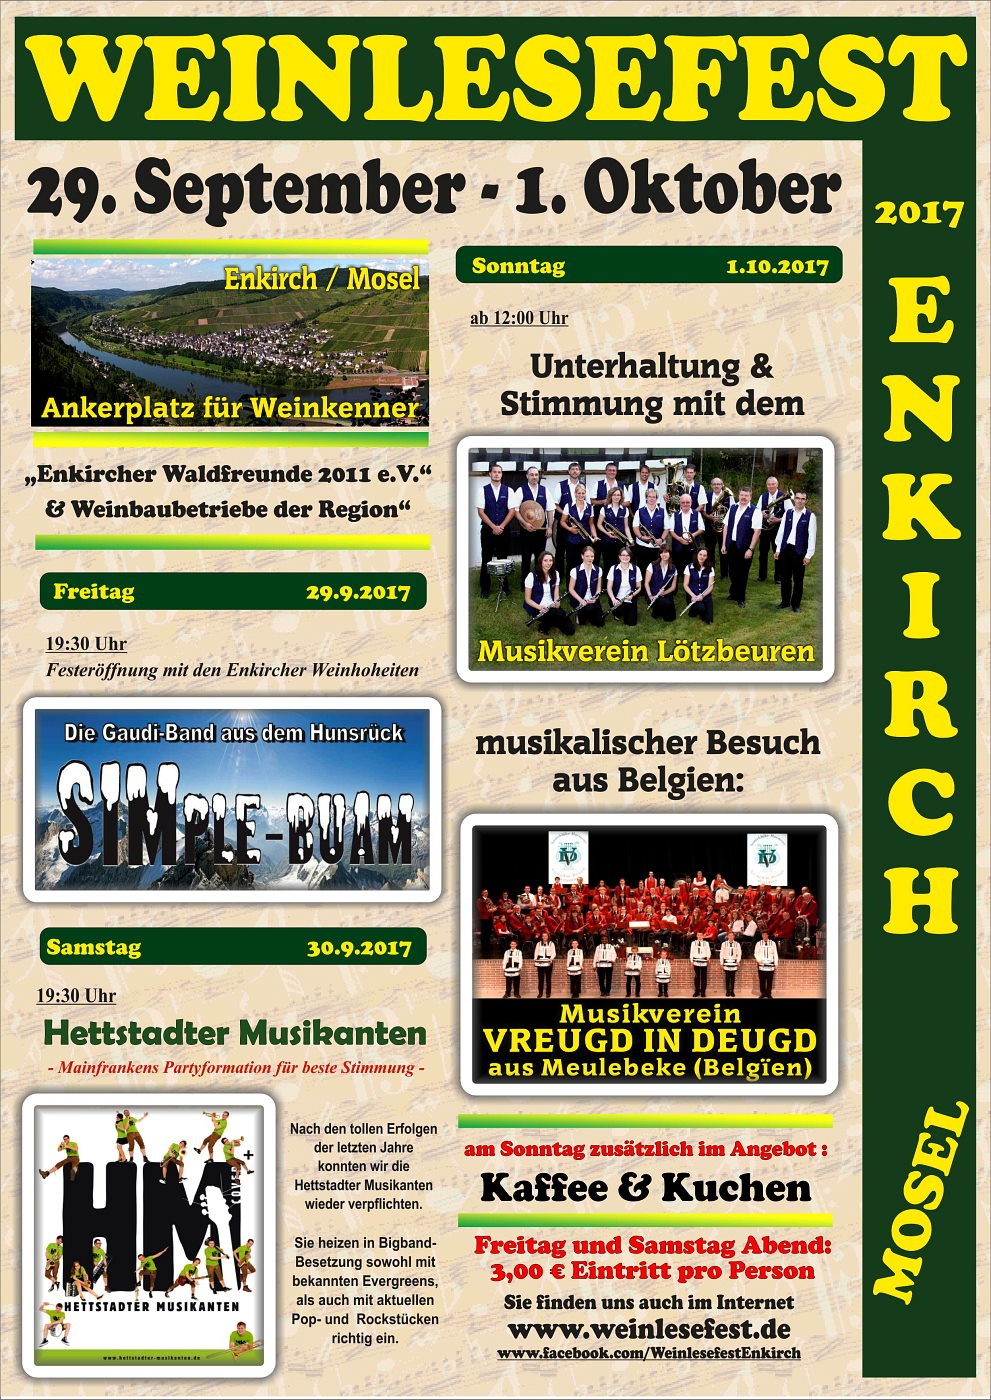 Weinlesefest 2017 in Enkirch / Mosel